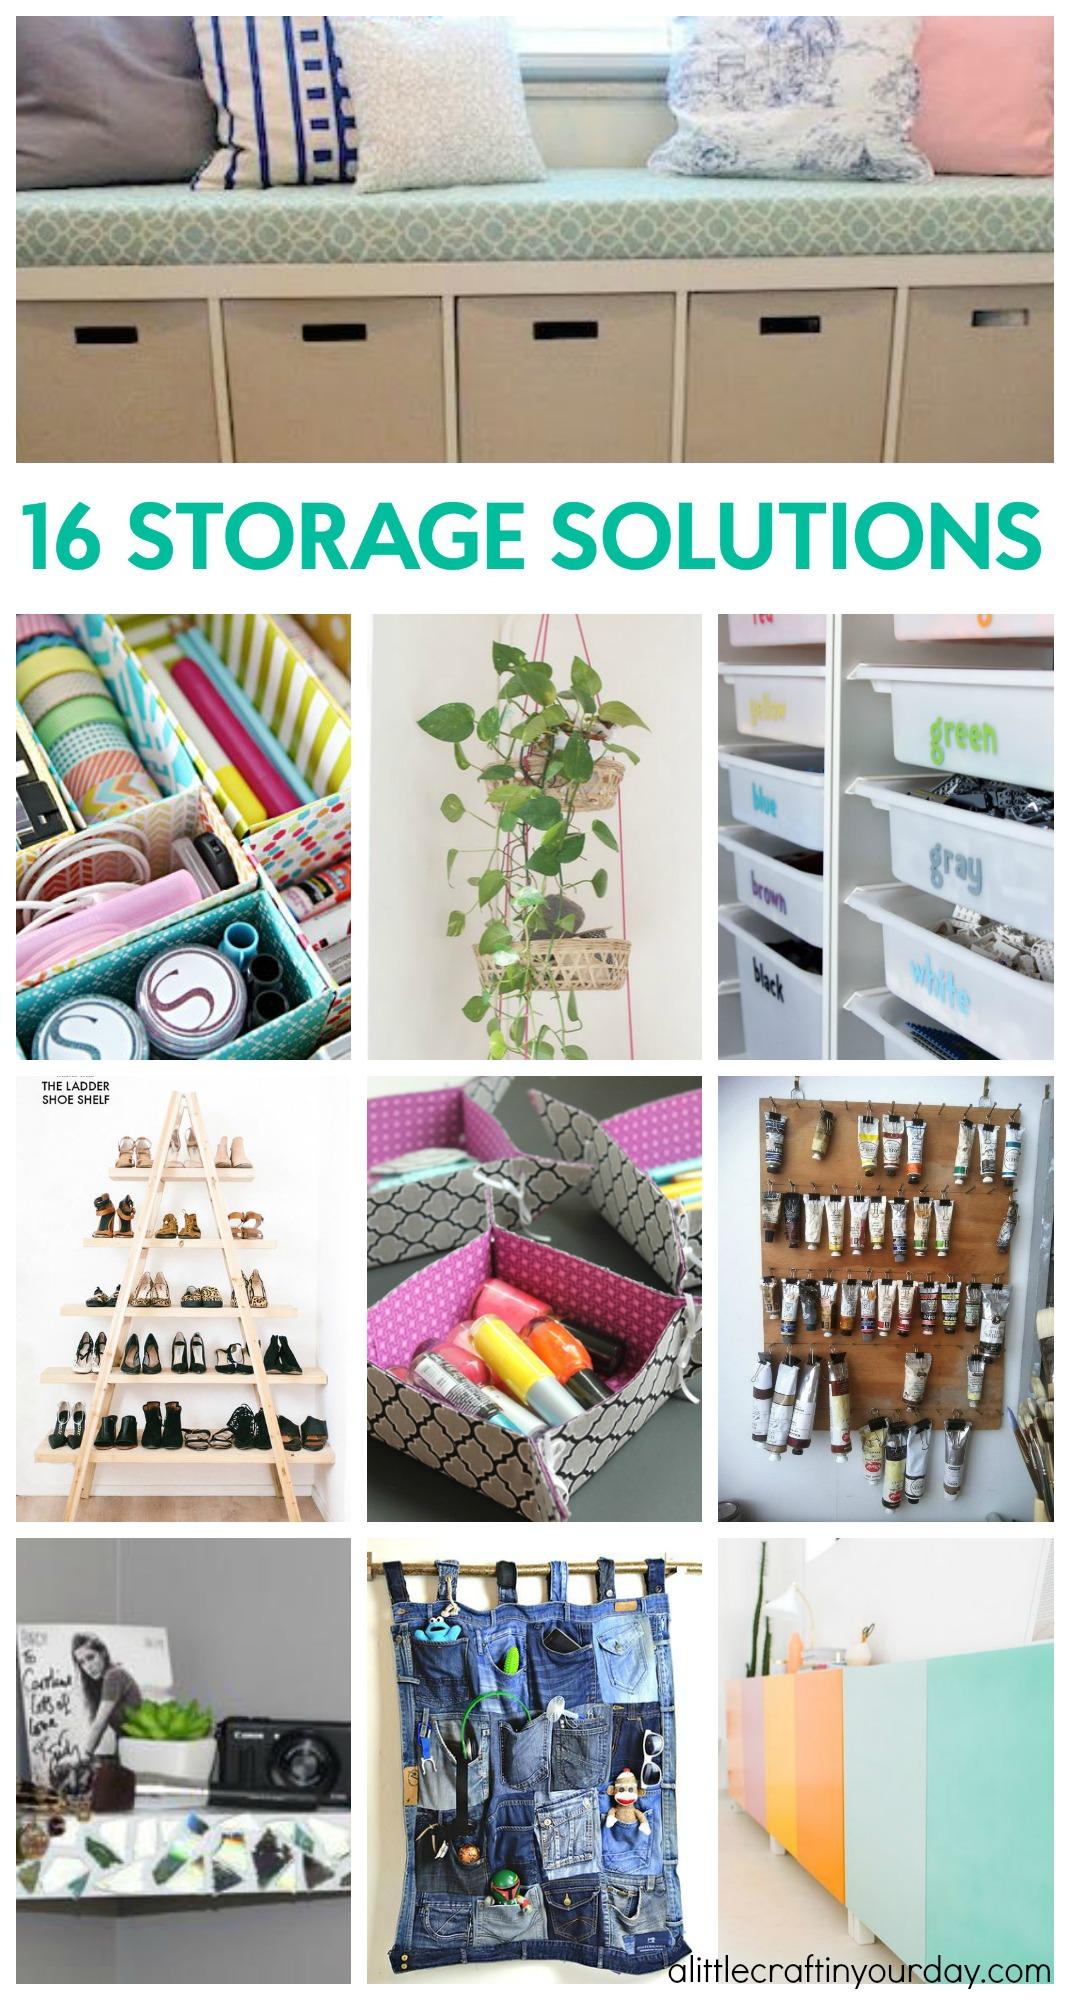 16_Storage_Solutions